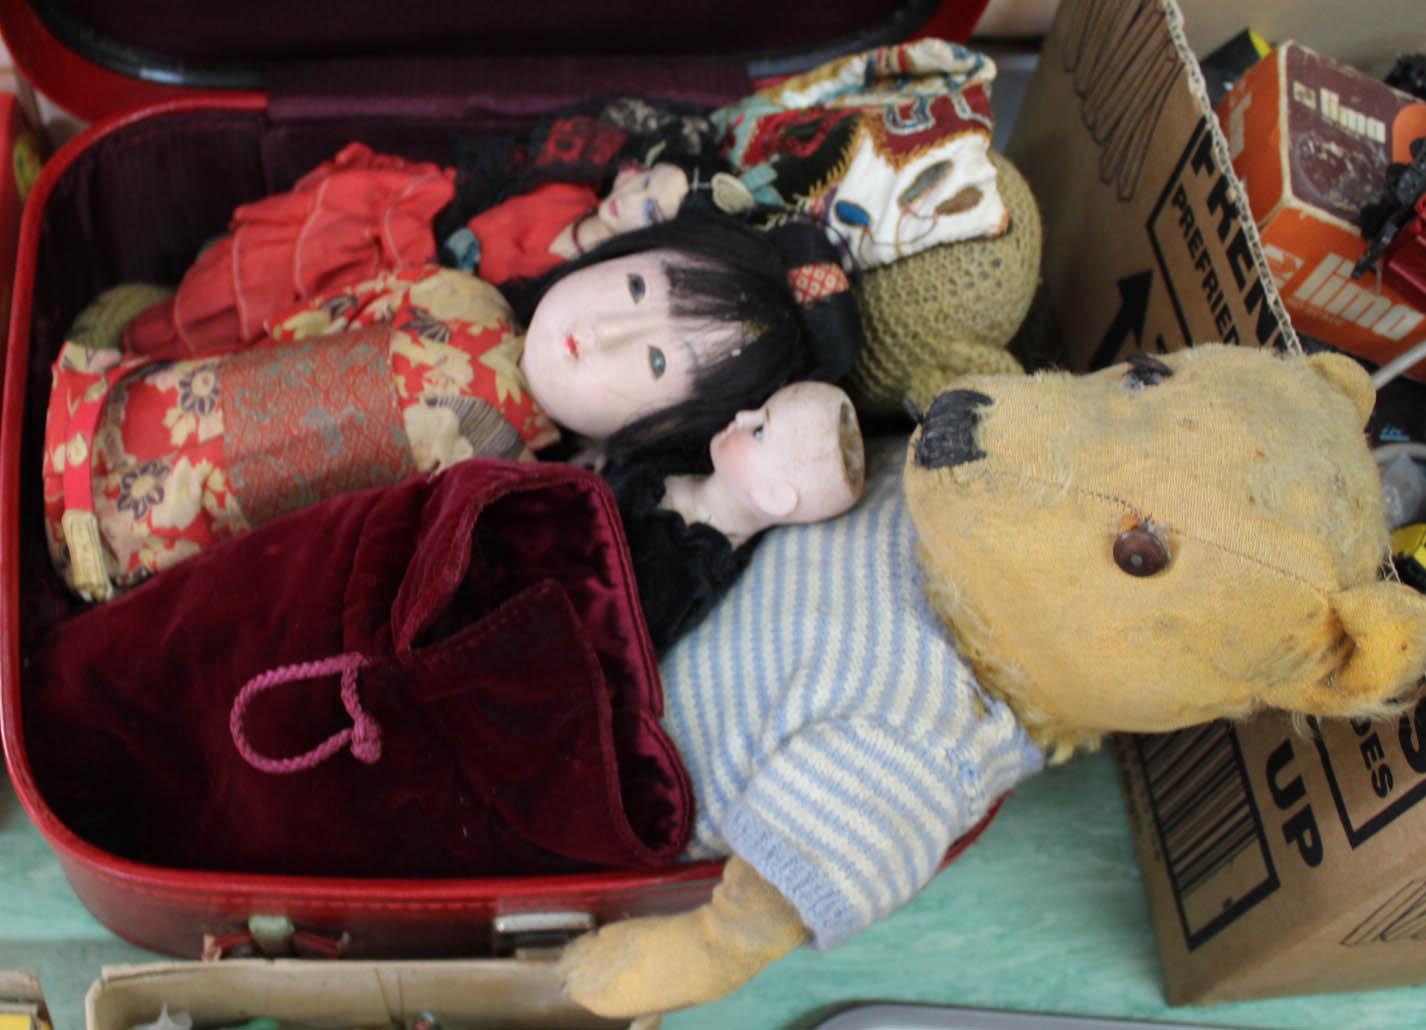 Lot 21 - Porcelain head plus other costume dolls and bears plus various plastic figures